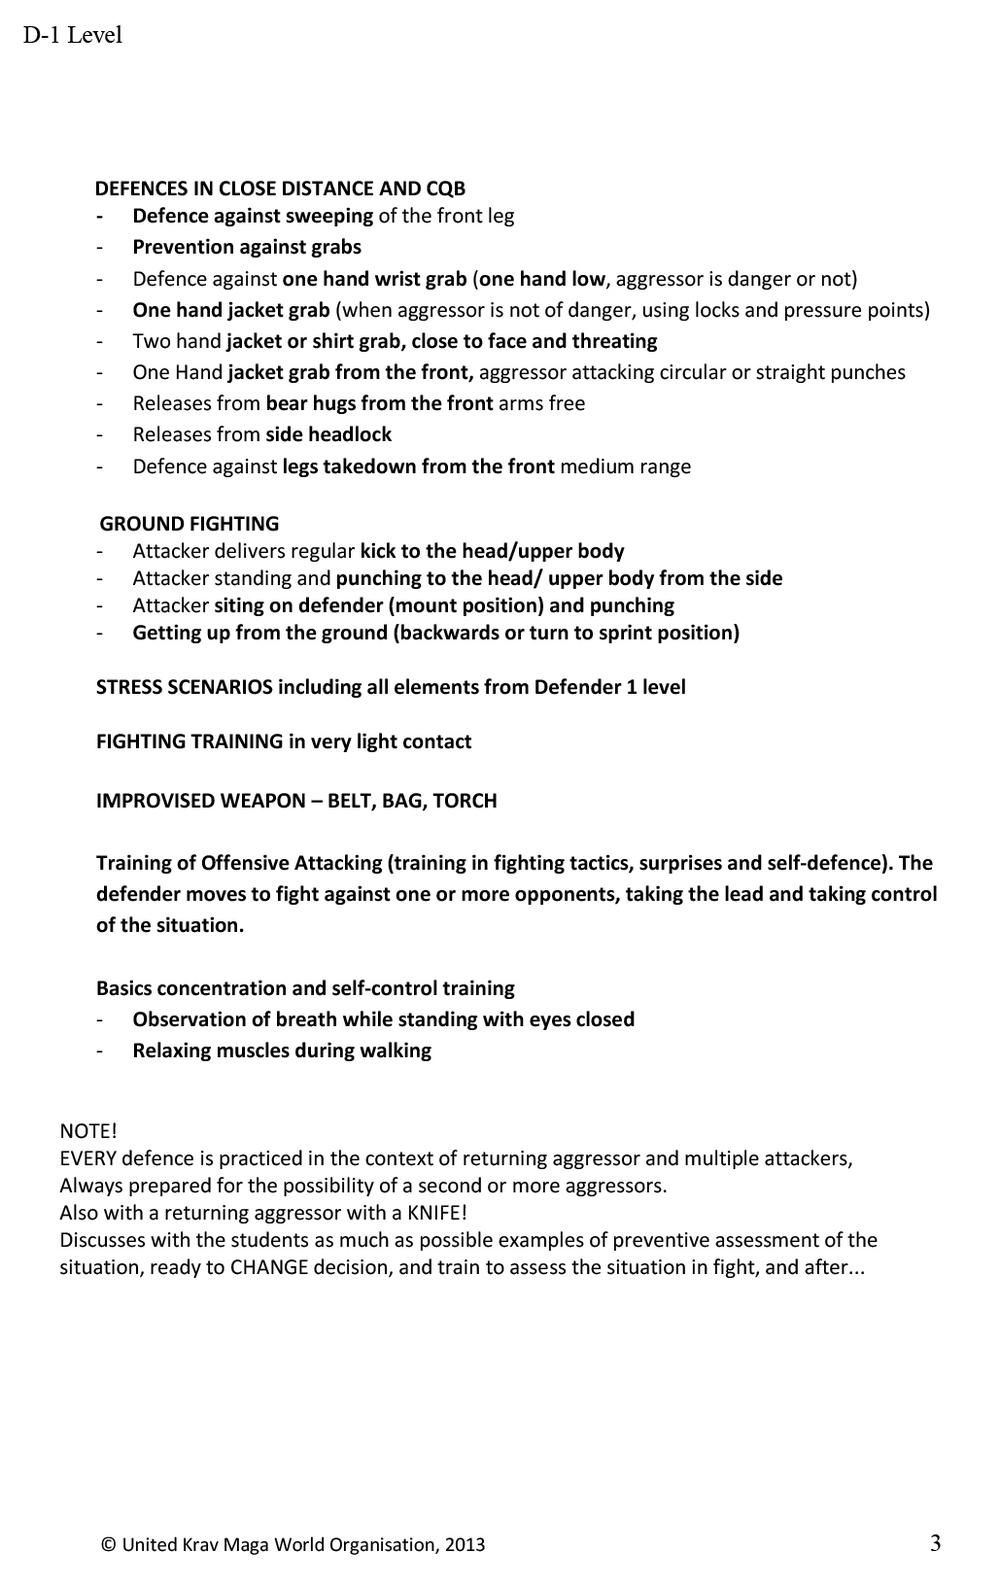 D1_ENGLISH.pdf-3.jpg